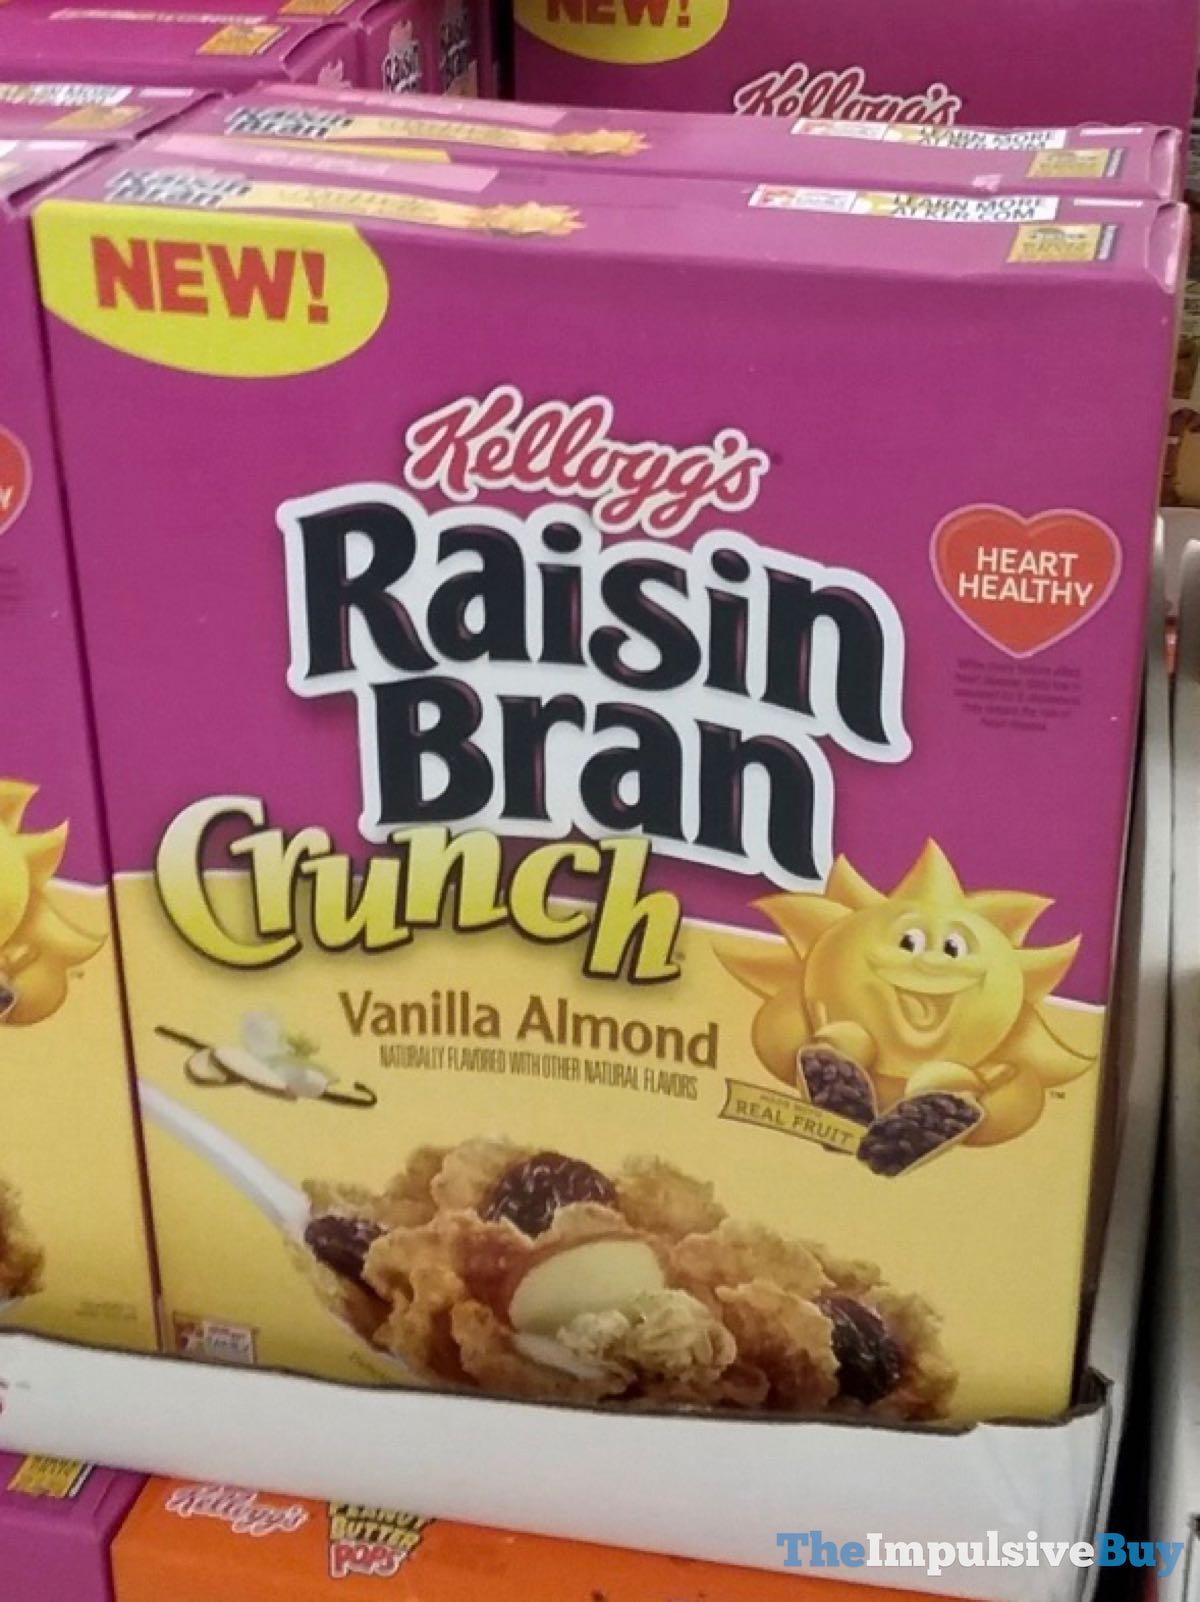 SPOTTED: Kellogg's Raisin Bran Crunch Vanilla Almond Cereal - The Impulsive Buy